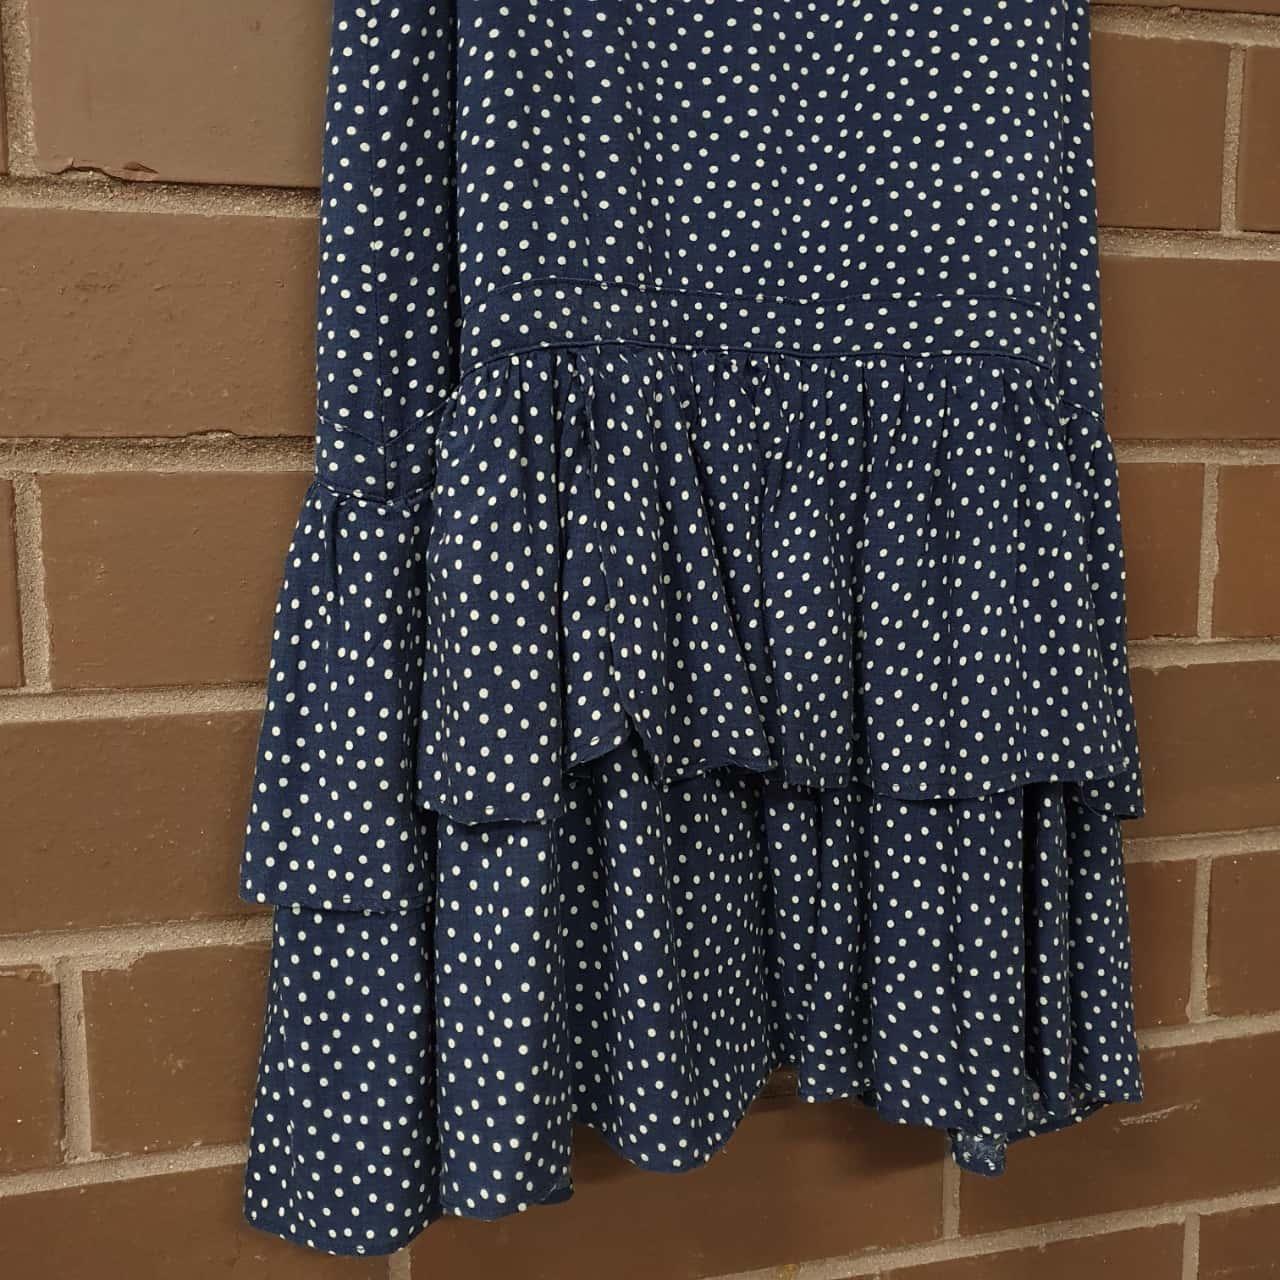 Tommy Hilfiger Polka Dot Dress Size 8/10 Years Blue/White